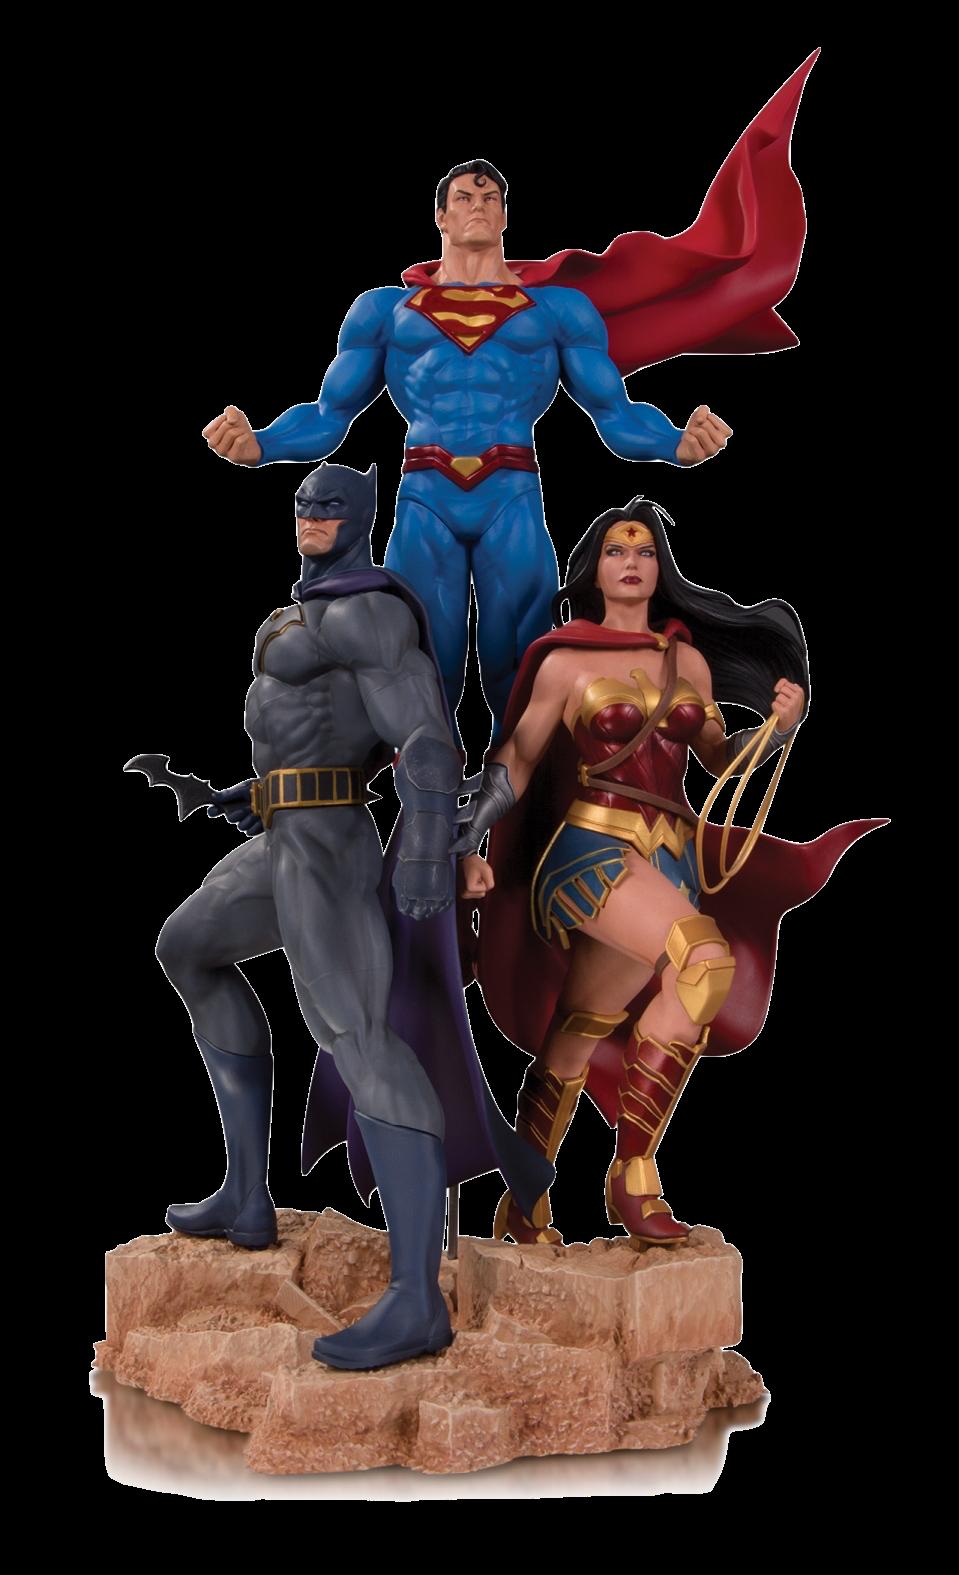 dc-designer-series-trinity-statue-by-jason-fabok-statue-toyslife